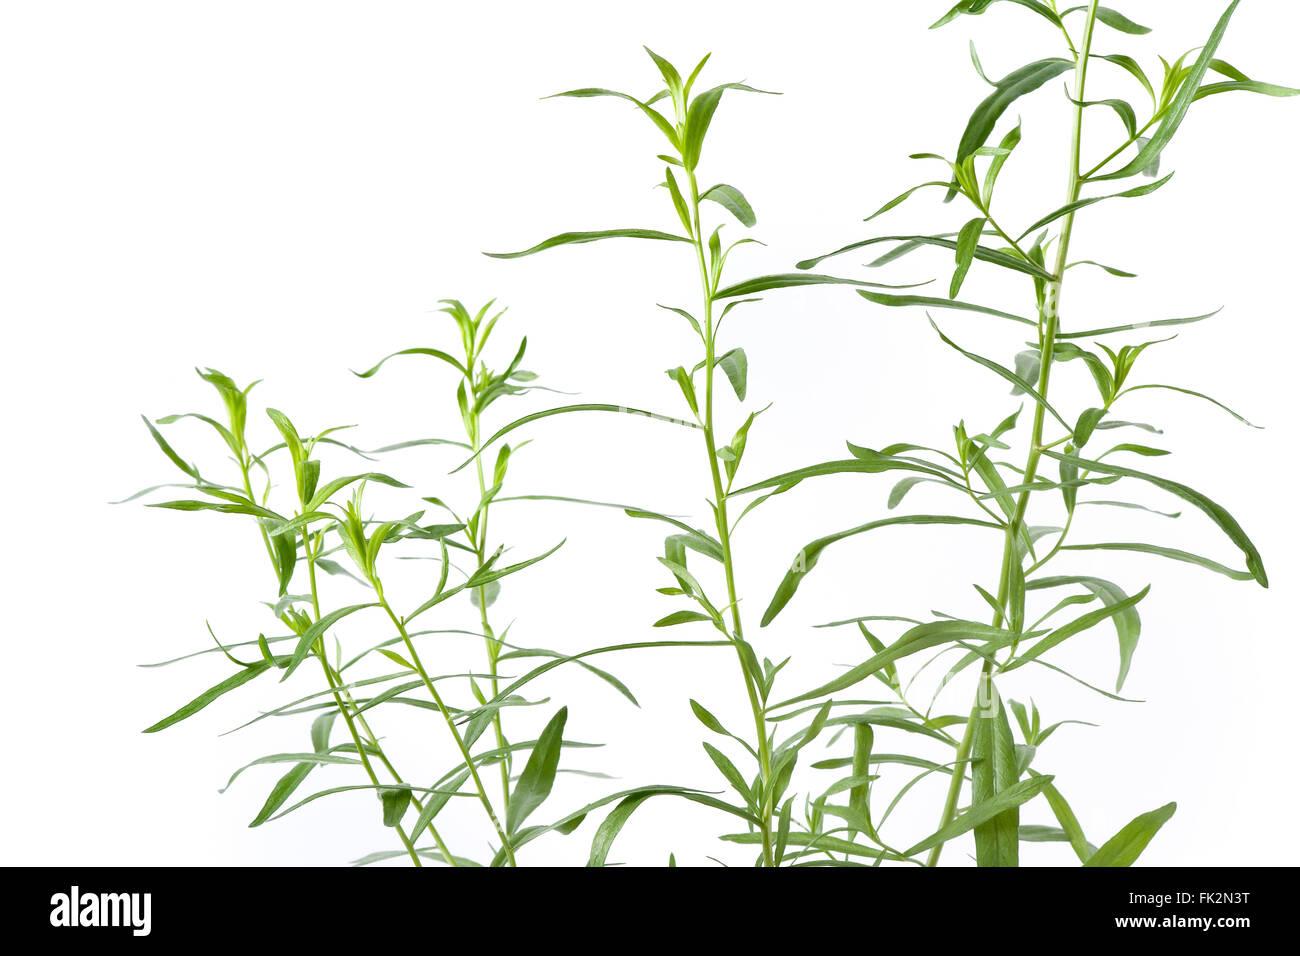 Fresh green Tarragon twigs On White Background - Stock Image